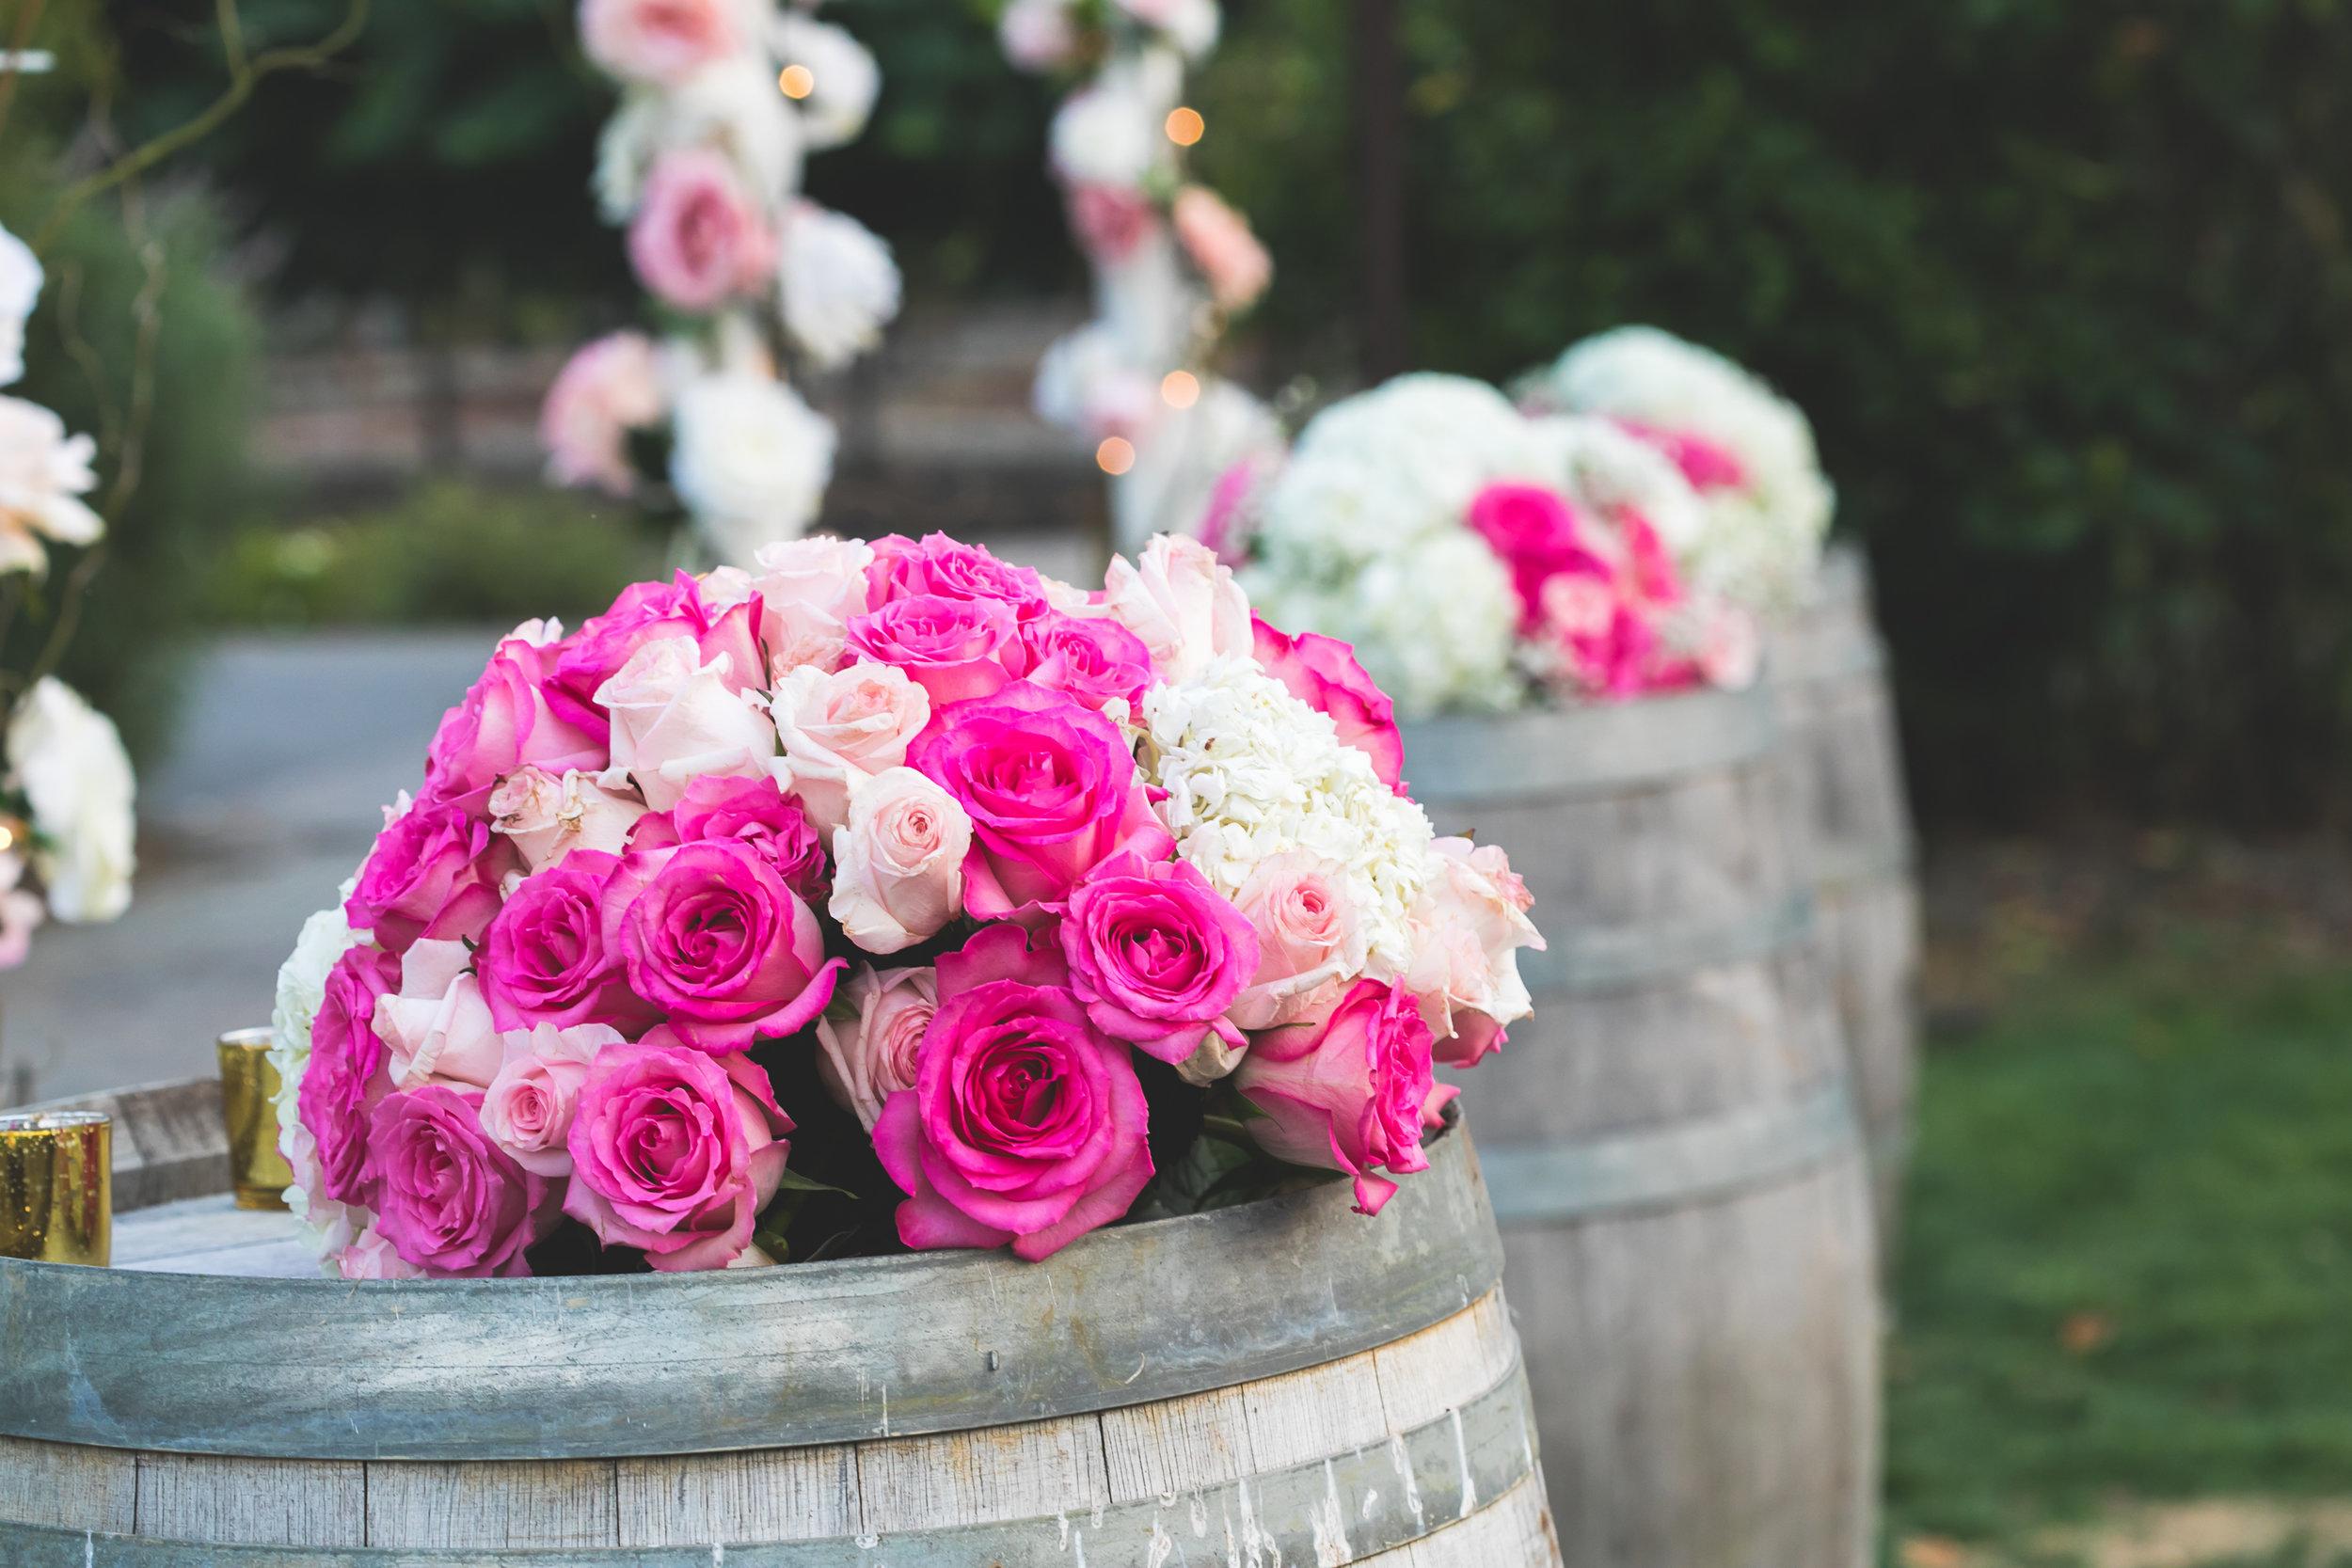 karina_asresh_wedding-0637.jpg